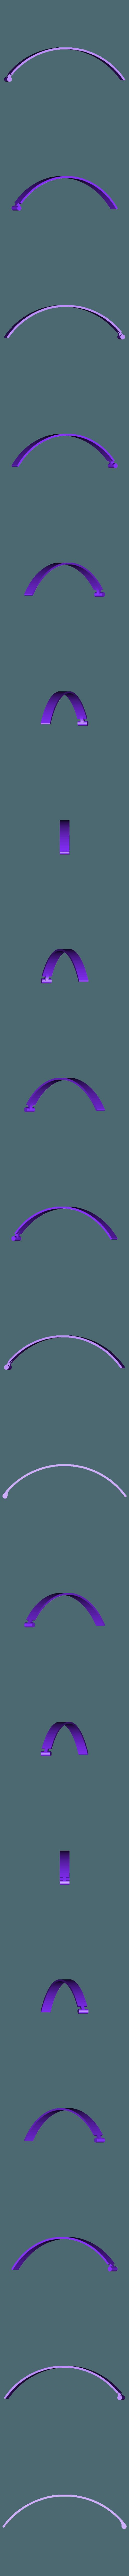 bag_clip_100mm_inside.stl Download free SCAD file Customizable Bag Clip • 3D printable design, WalterHsiao